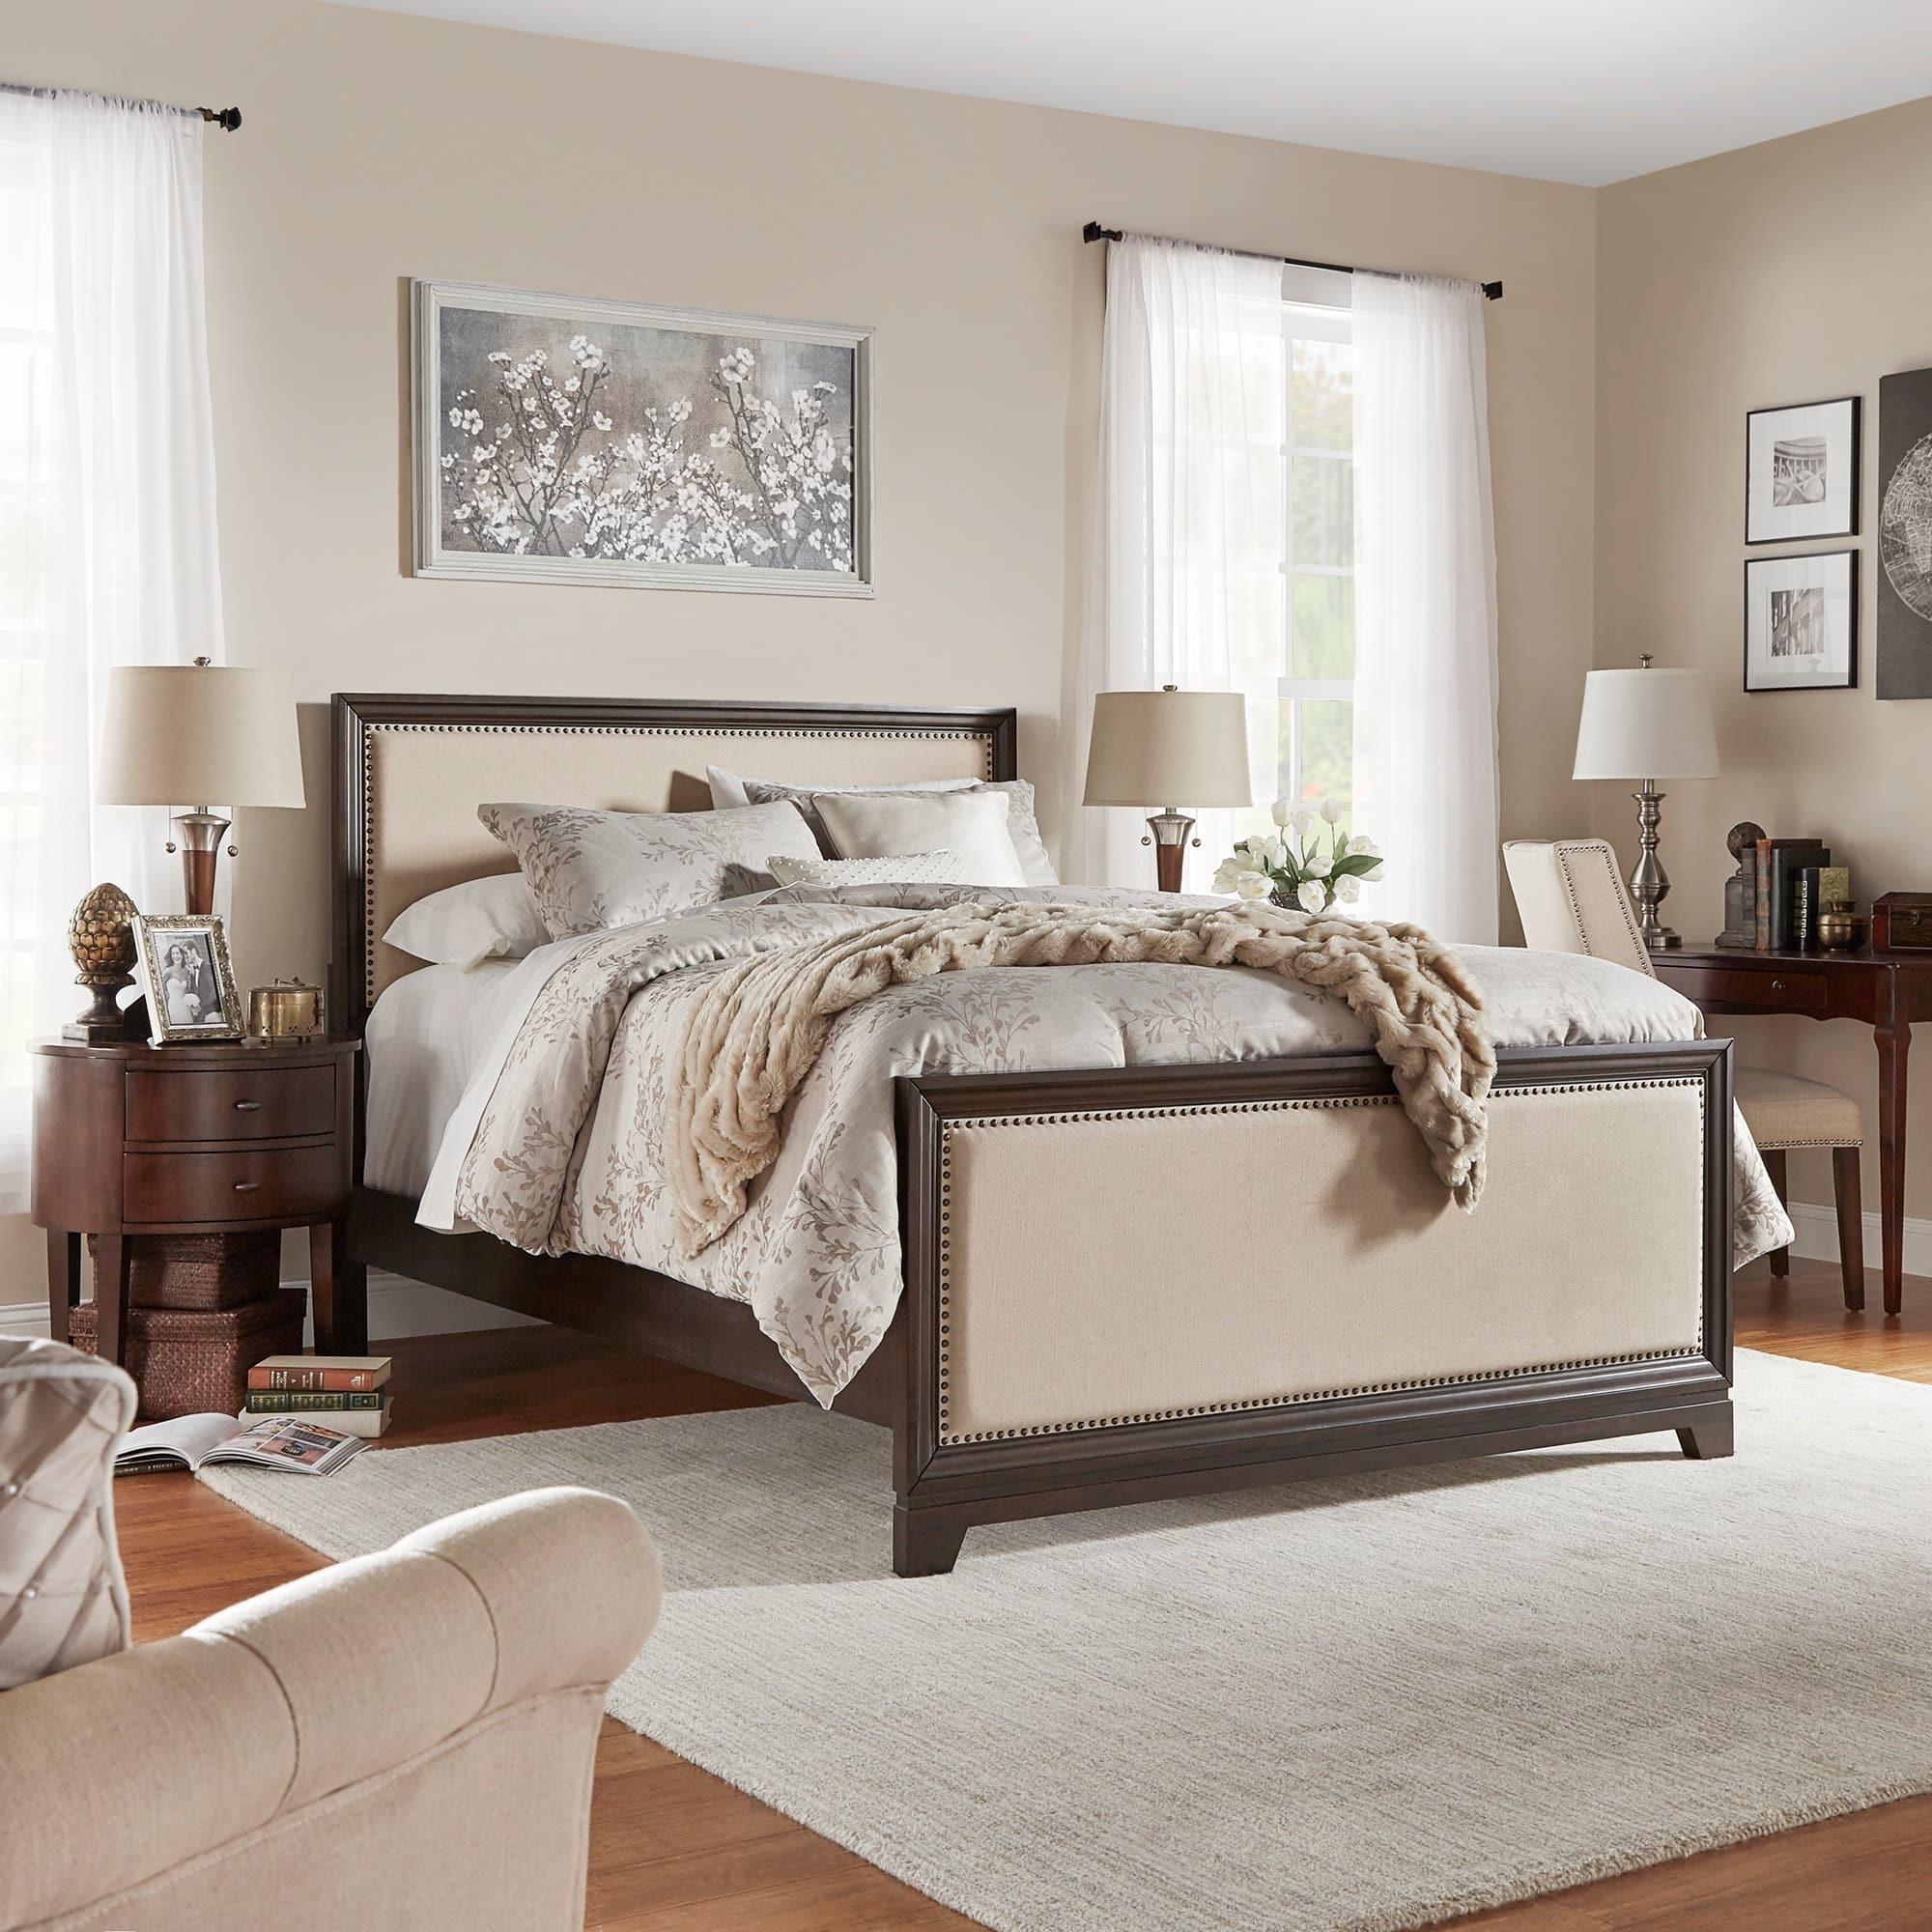 Buy Beds Online at Overstock.com   Our Best Bedroom Furniture Deals